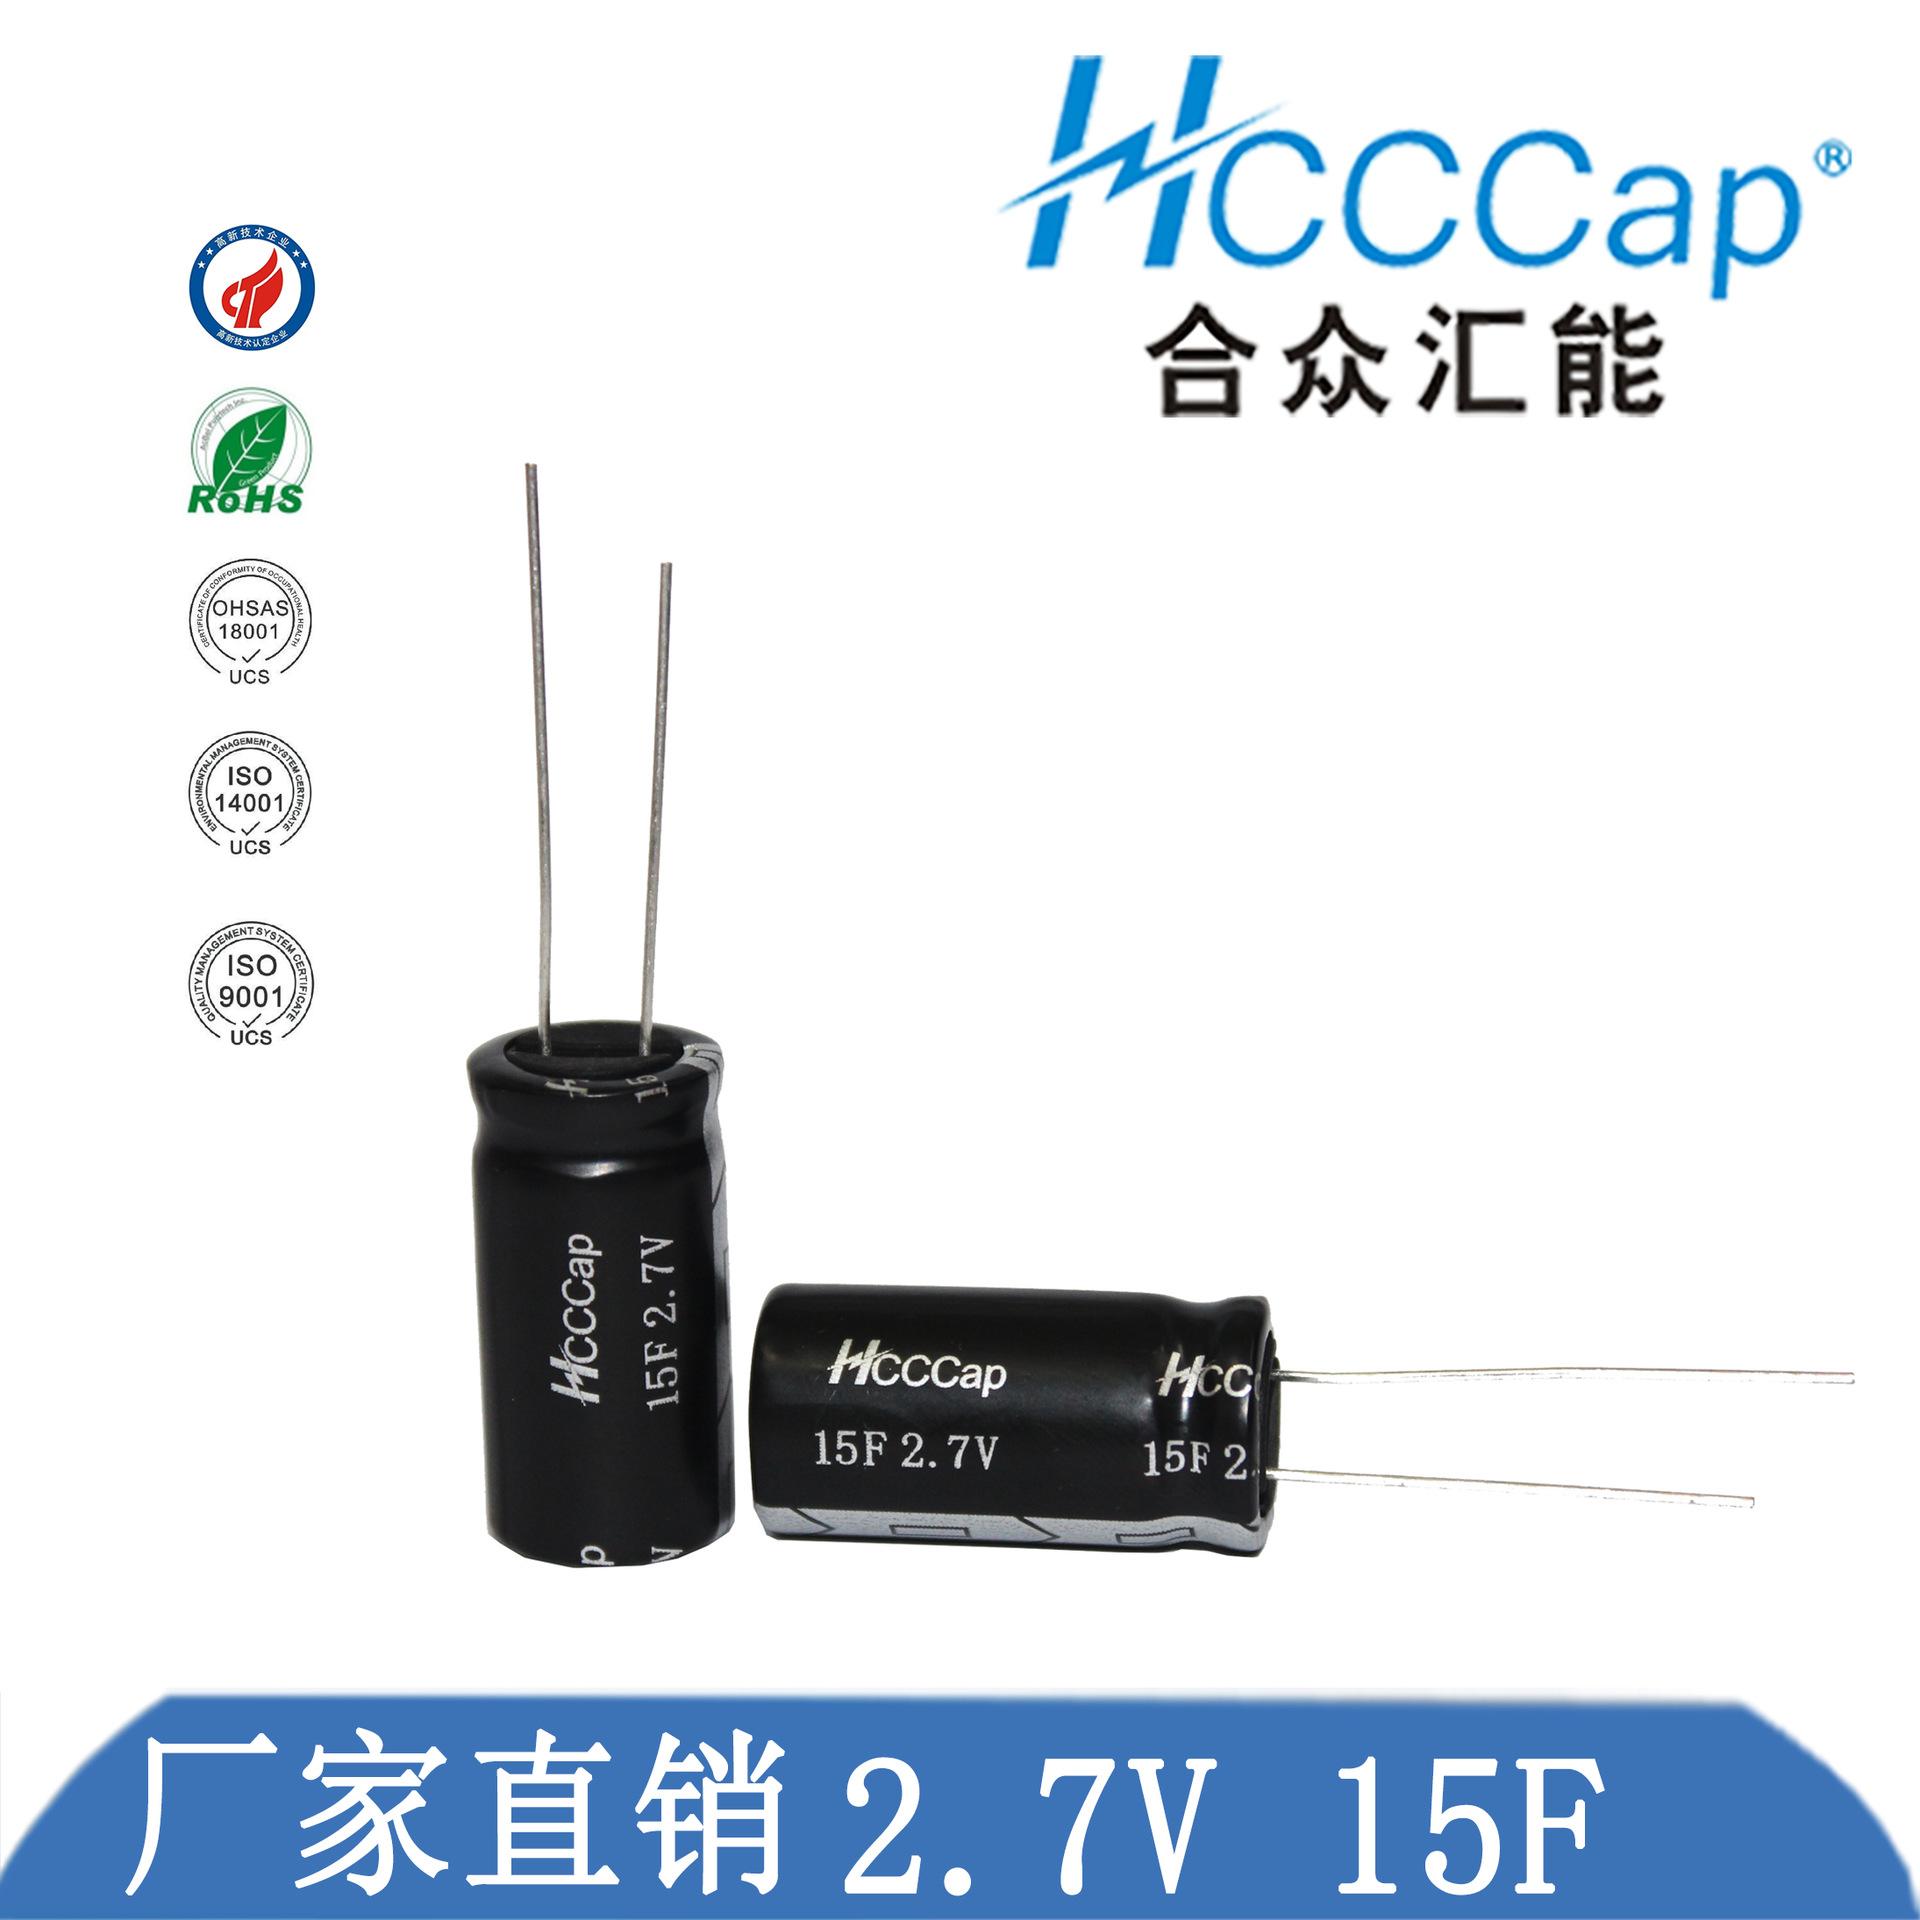 HCCCap合众汇能2.7V-15F超级电容厂家直销,详询15611260092